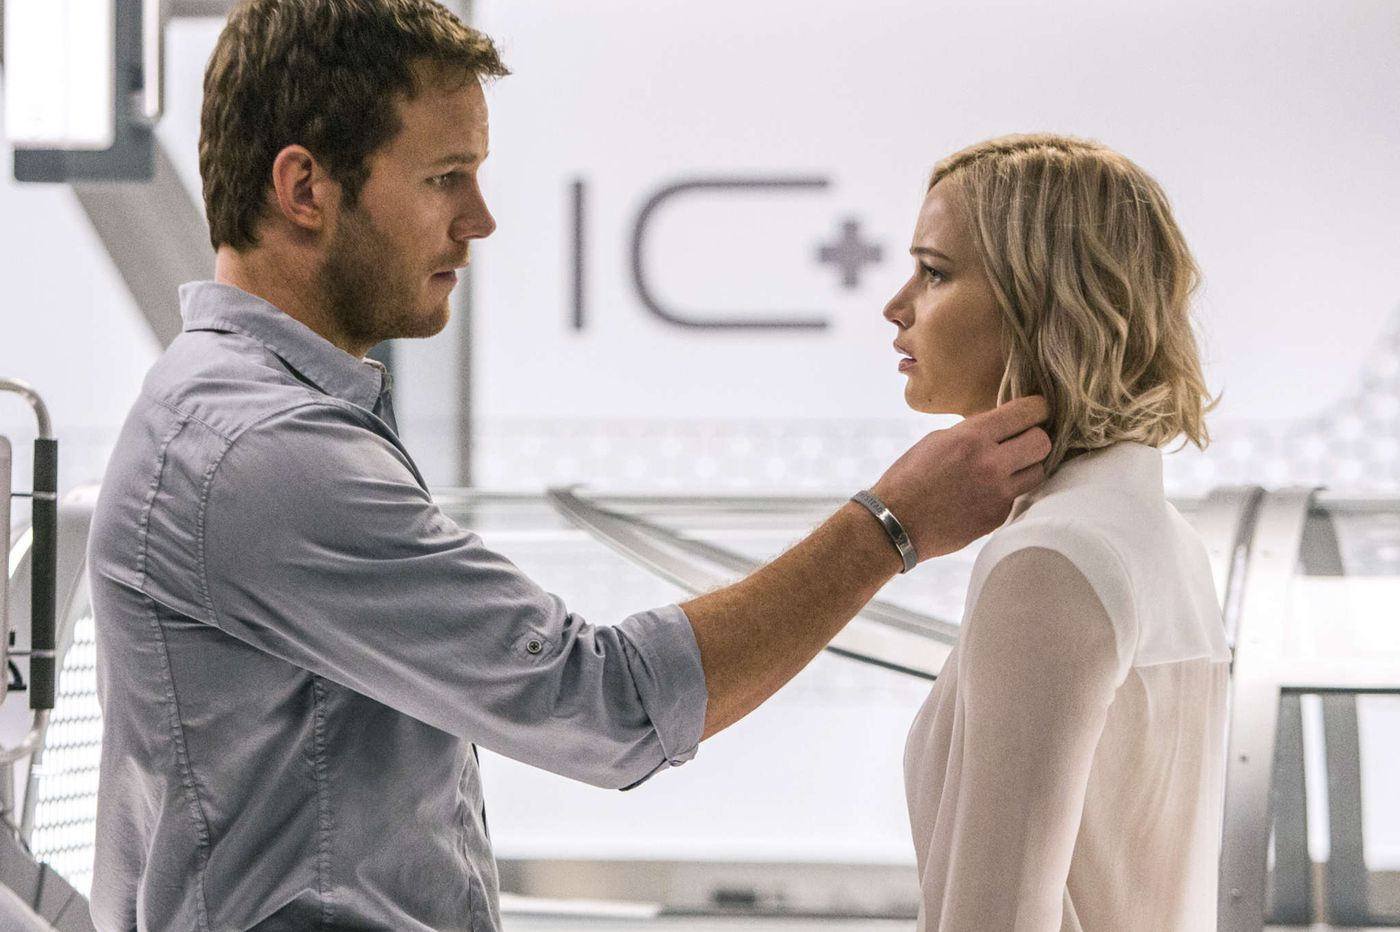 'Passengers', Jennifer Lawrence and Chris Pratt in cosmic love story